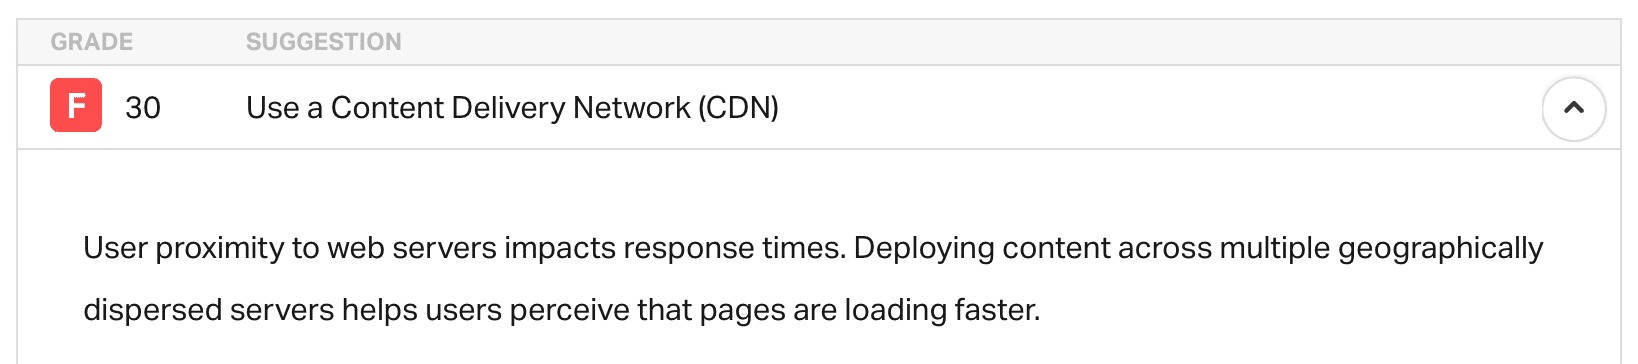 Brug et Content Delivery Network (CDN)